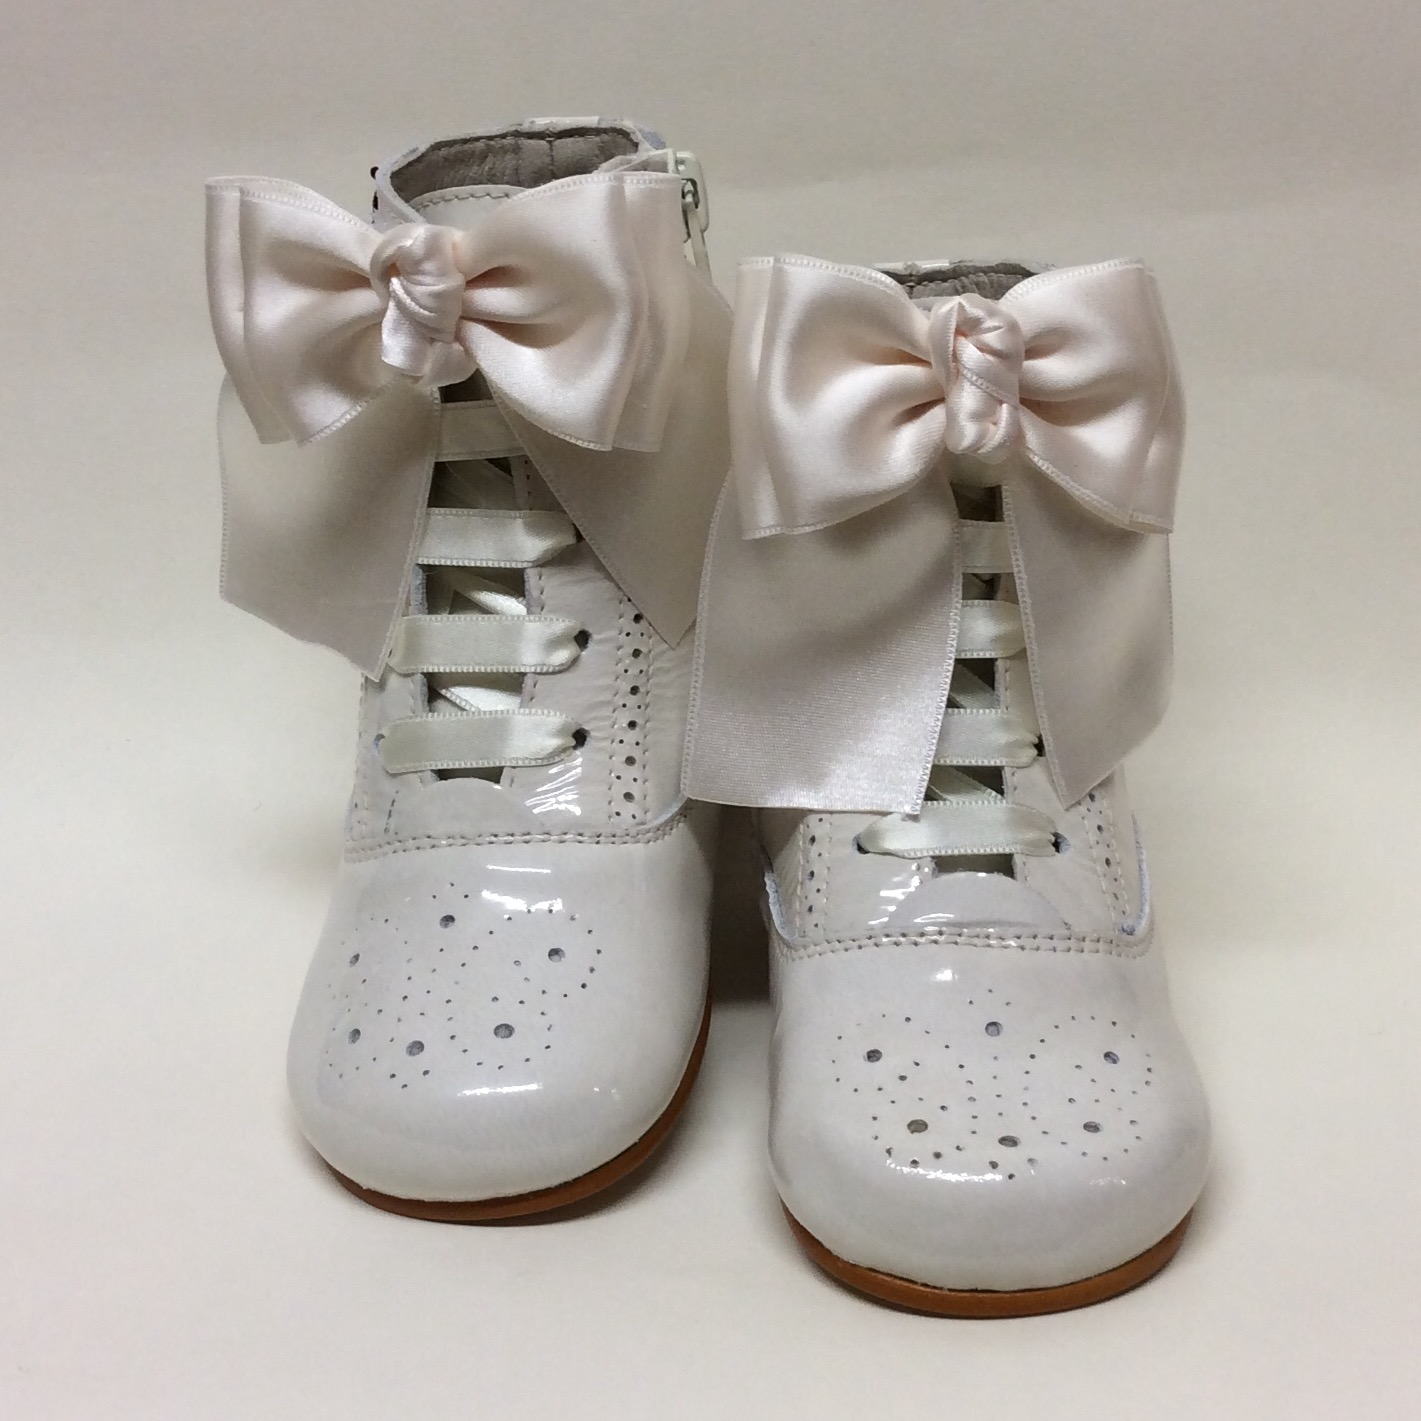 Rose Satin Bow Boots, Cream